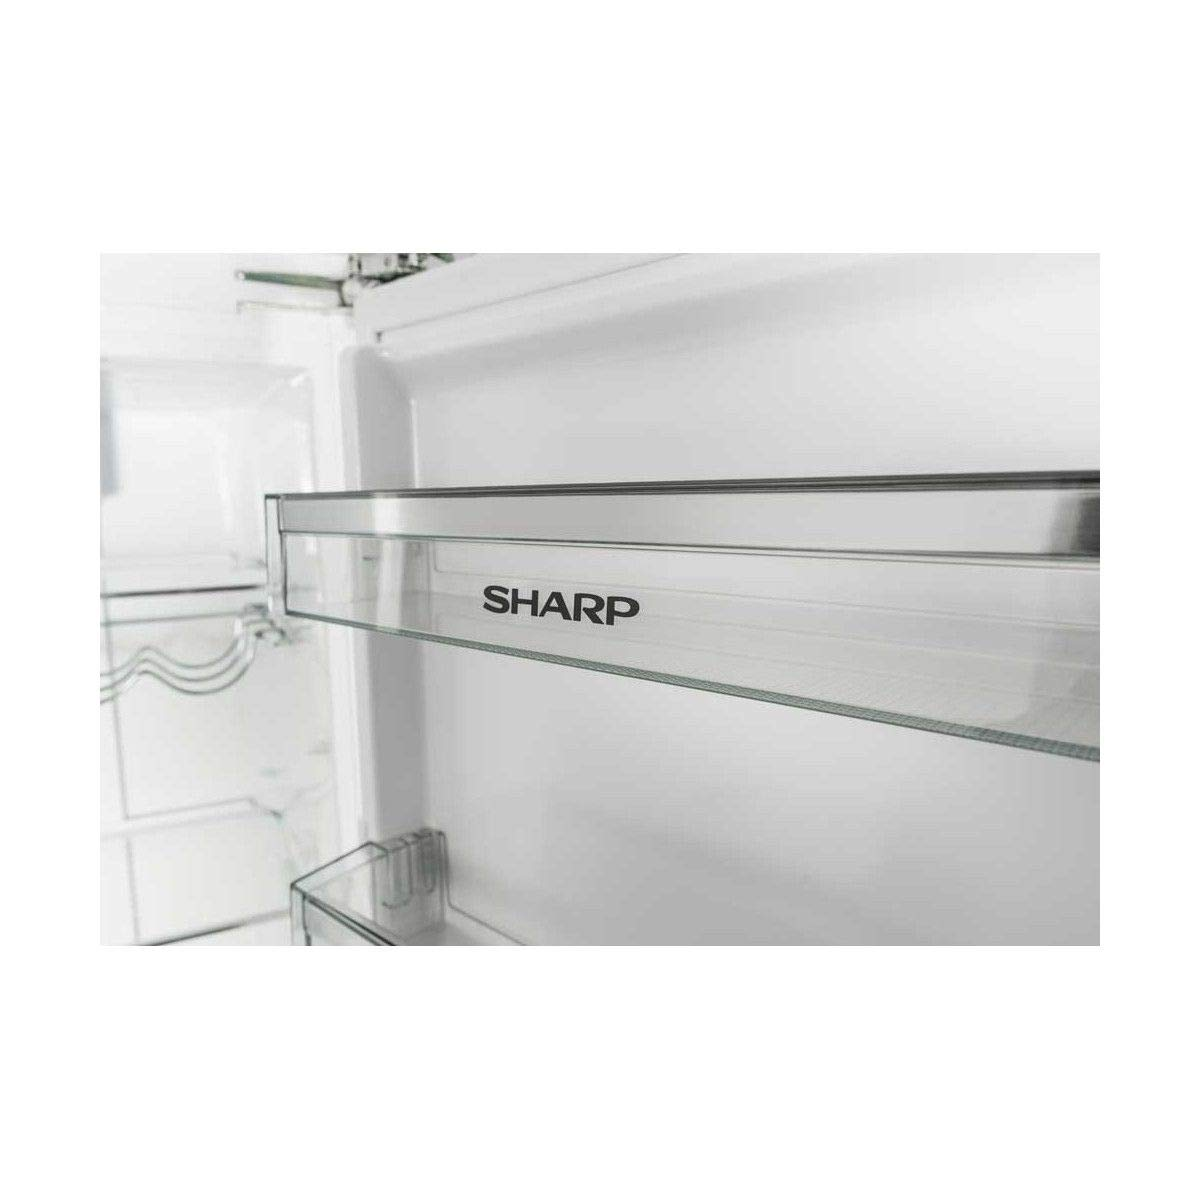 Refrigerador Sharp SJL 2300 E 01 X: Amazon.es: Grandes ...